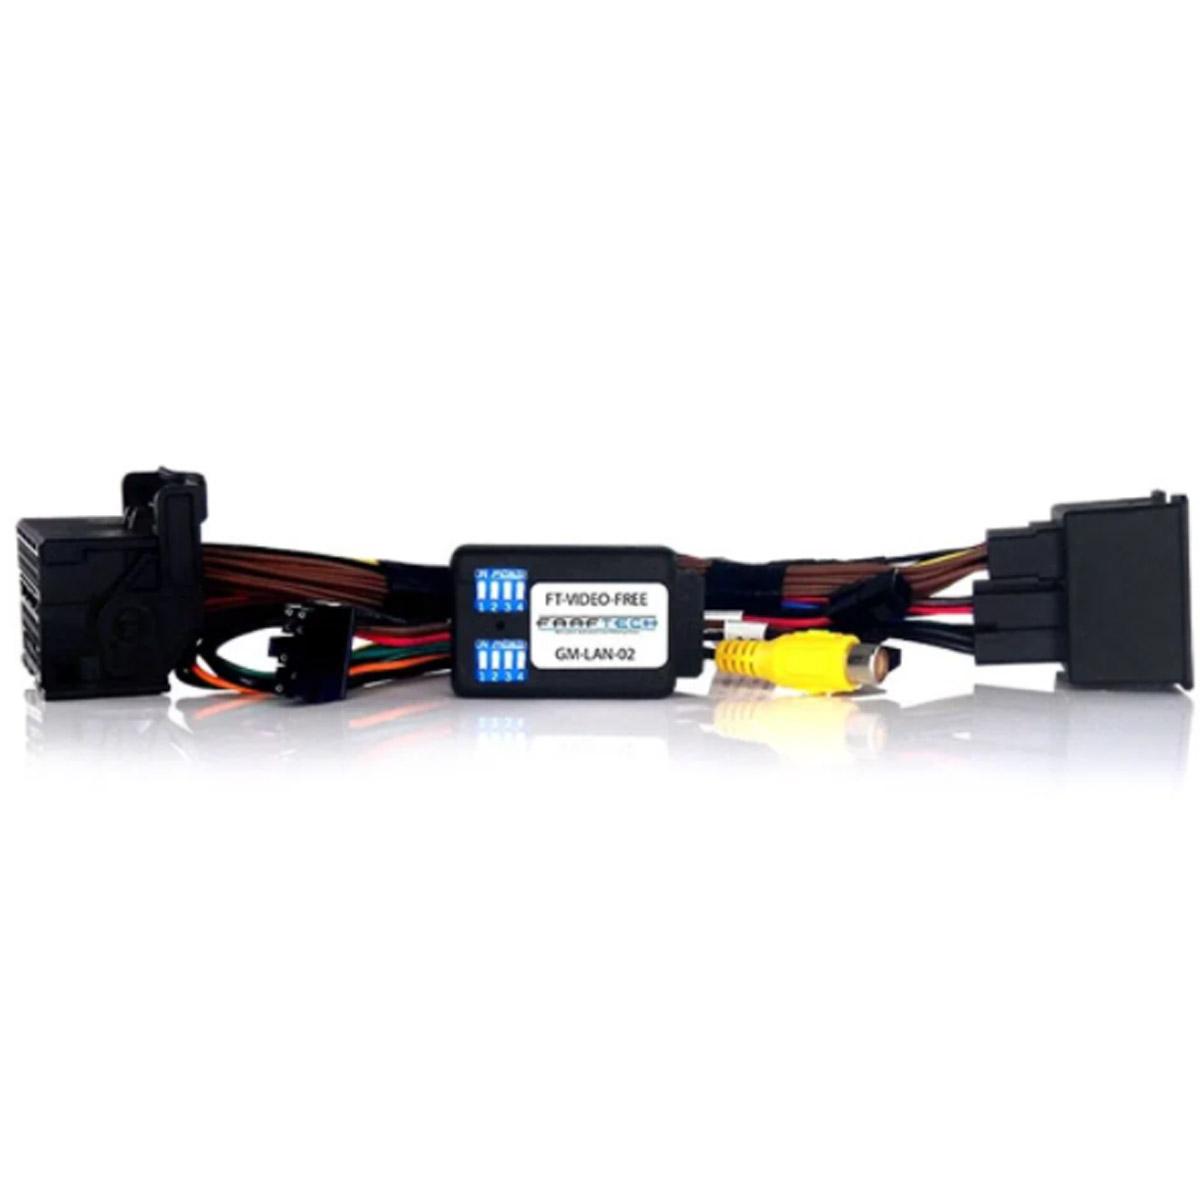 Desbloqueio De Multimídia Faaftech GM S10 Trailblazer FT-VF-GM-LAN02